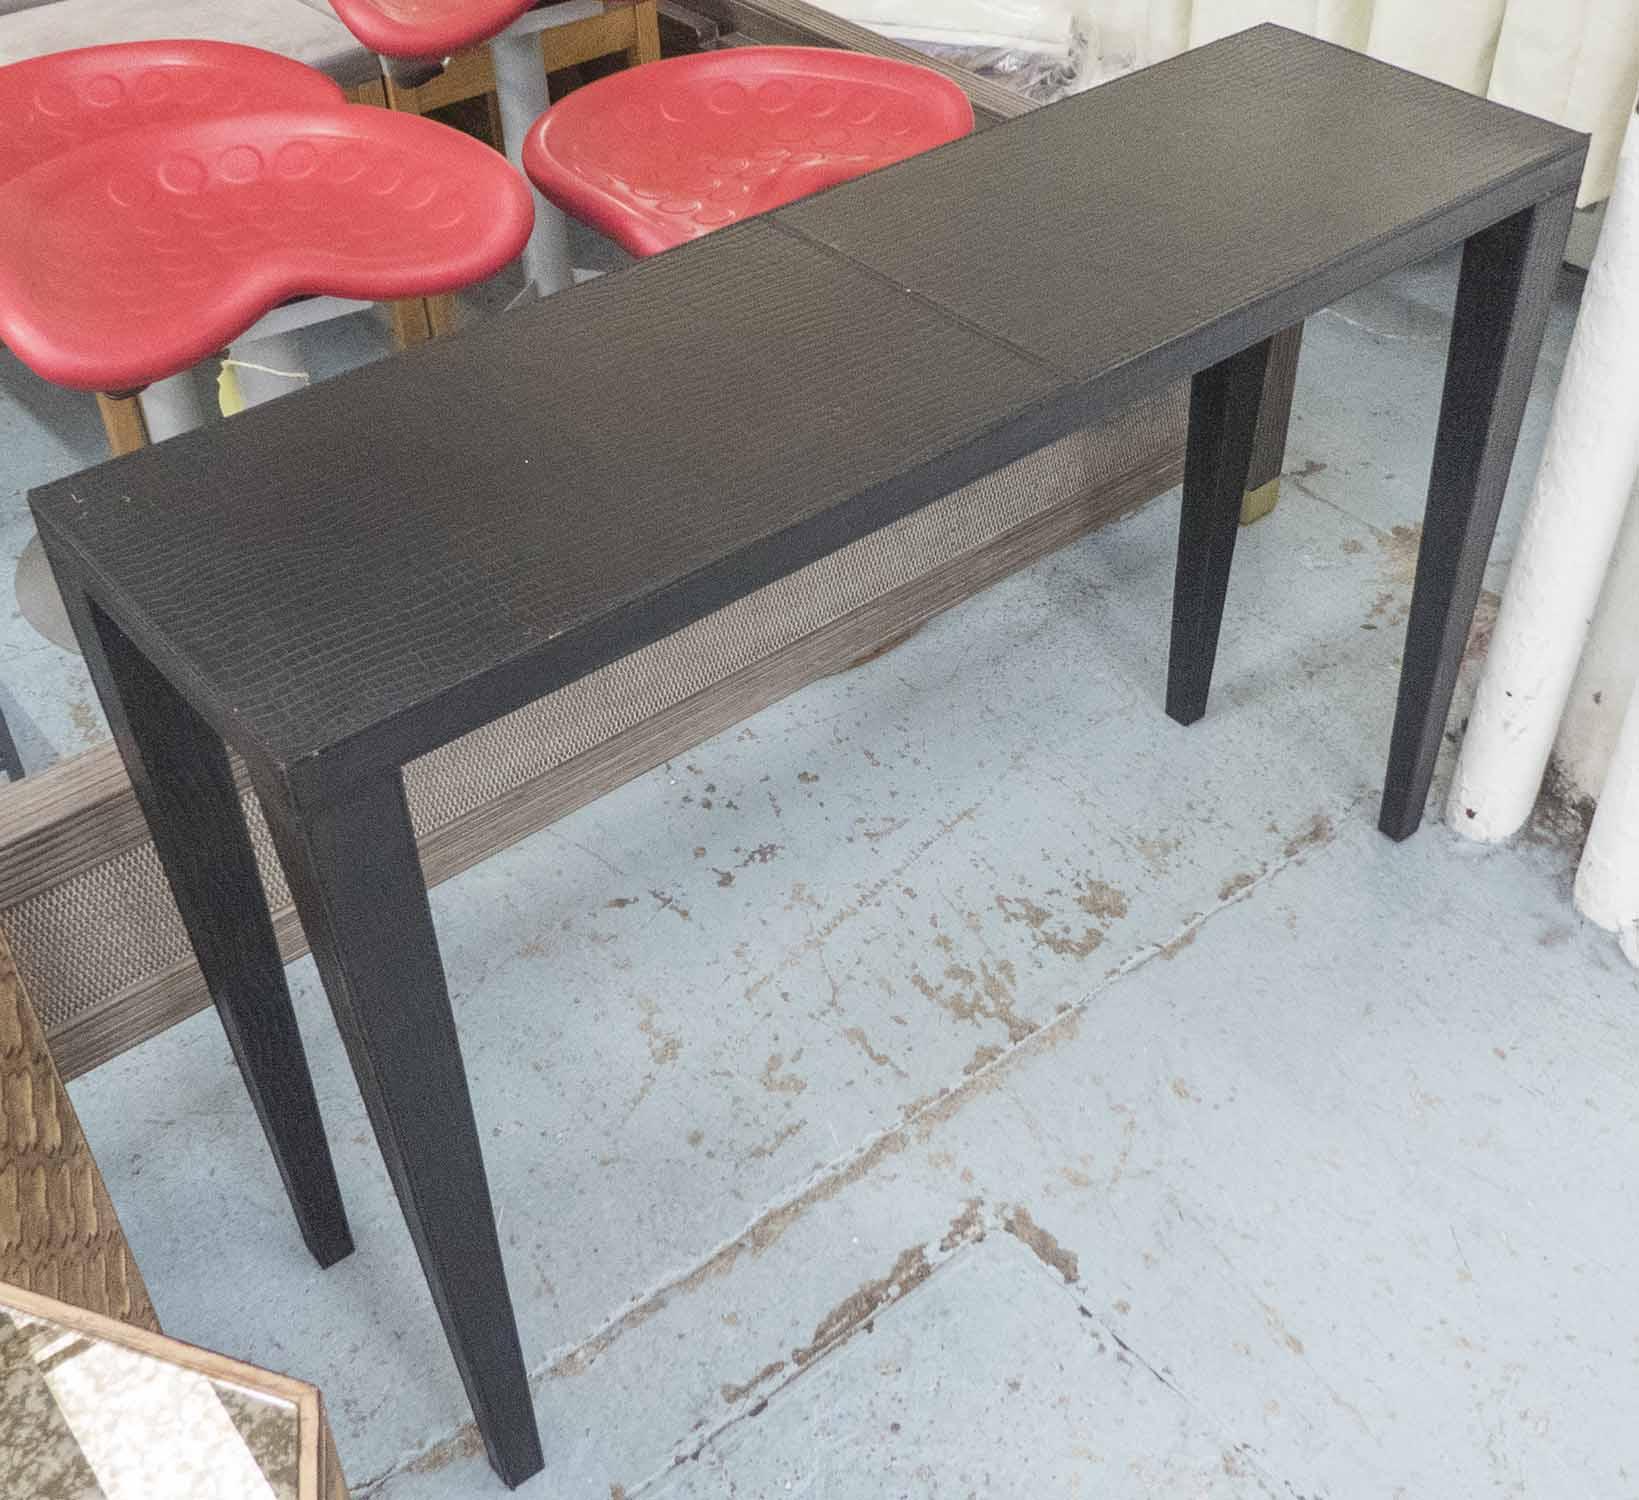 Lot 51 - CONSOLE TABLE, in faux crocodile skin patterned black leather, 120cm L x 36cm W x 81cm H.